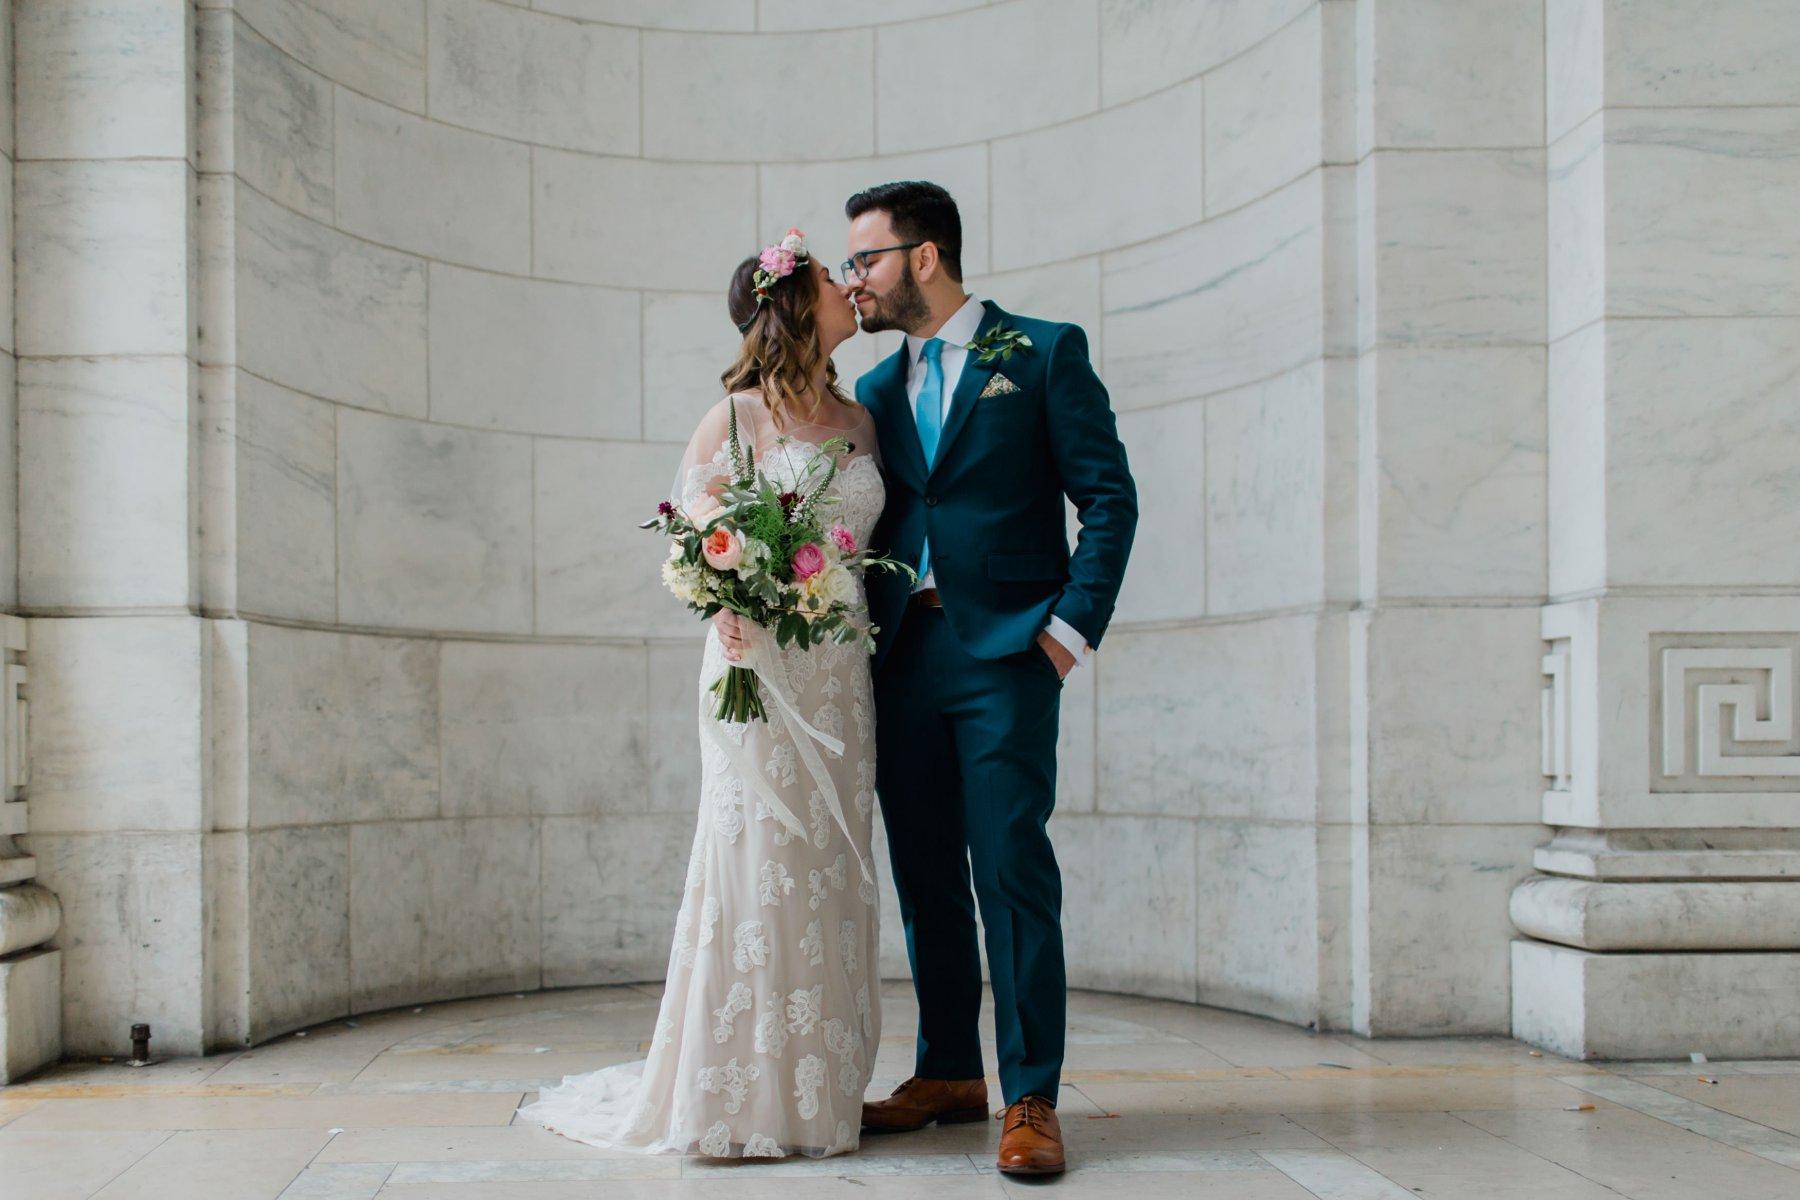 wedding at Bryant Park Manhattan New York Public Library